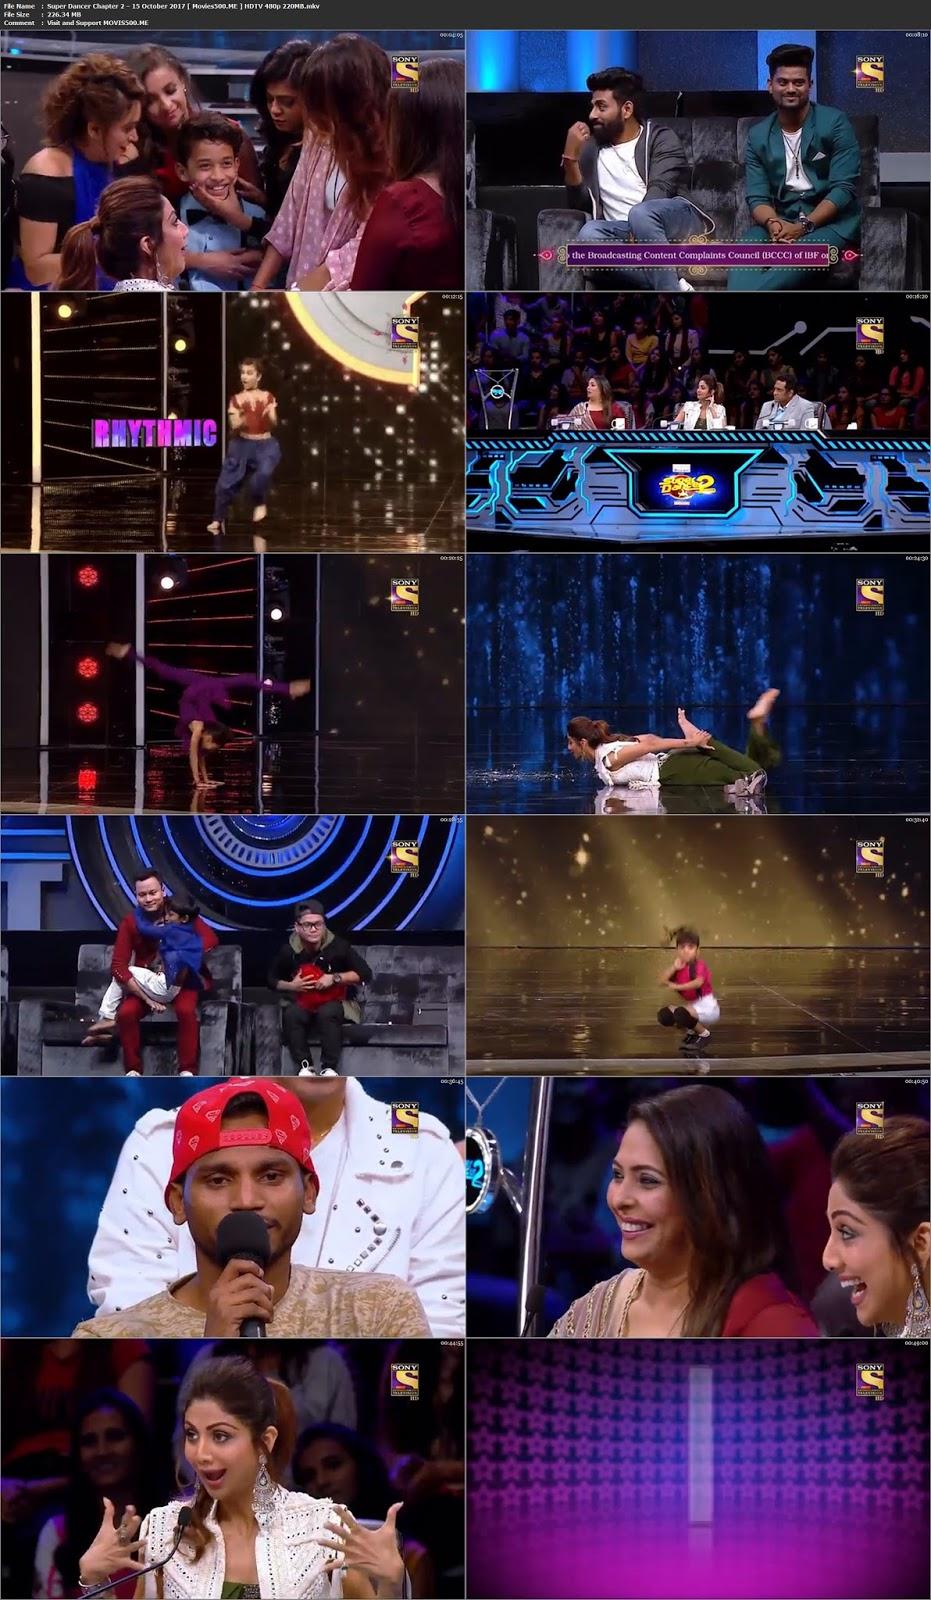 Super Dancer Chapter 2 2017 15 October 226MB HDTV 480p at pureeskep.review